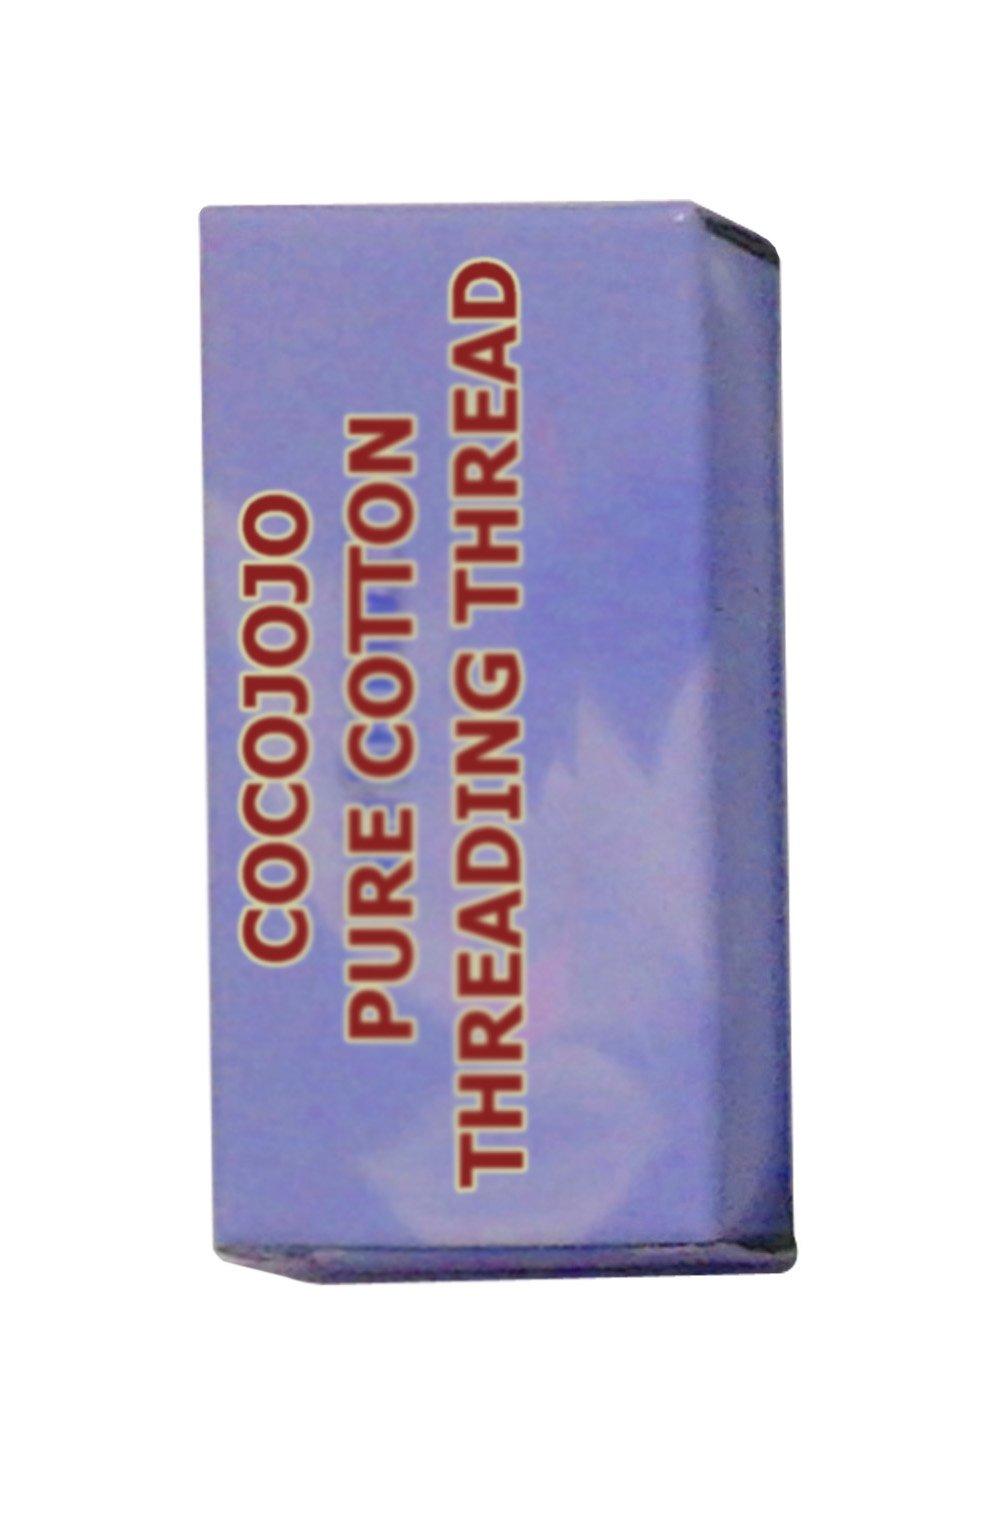 6 Box of Thread for Threading Eyebrow Hair Removal Machine